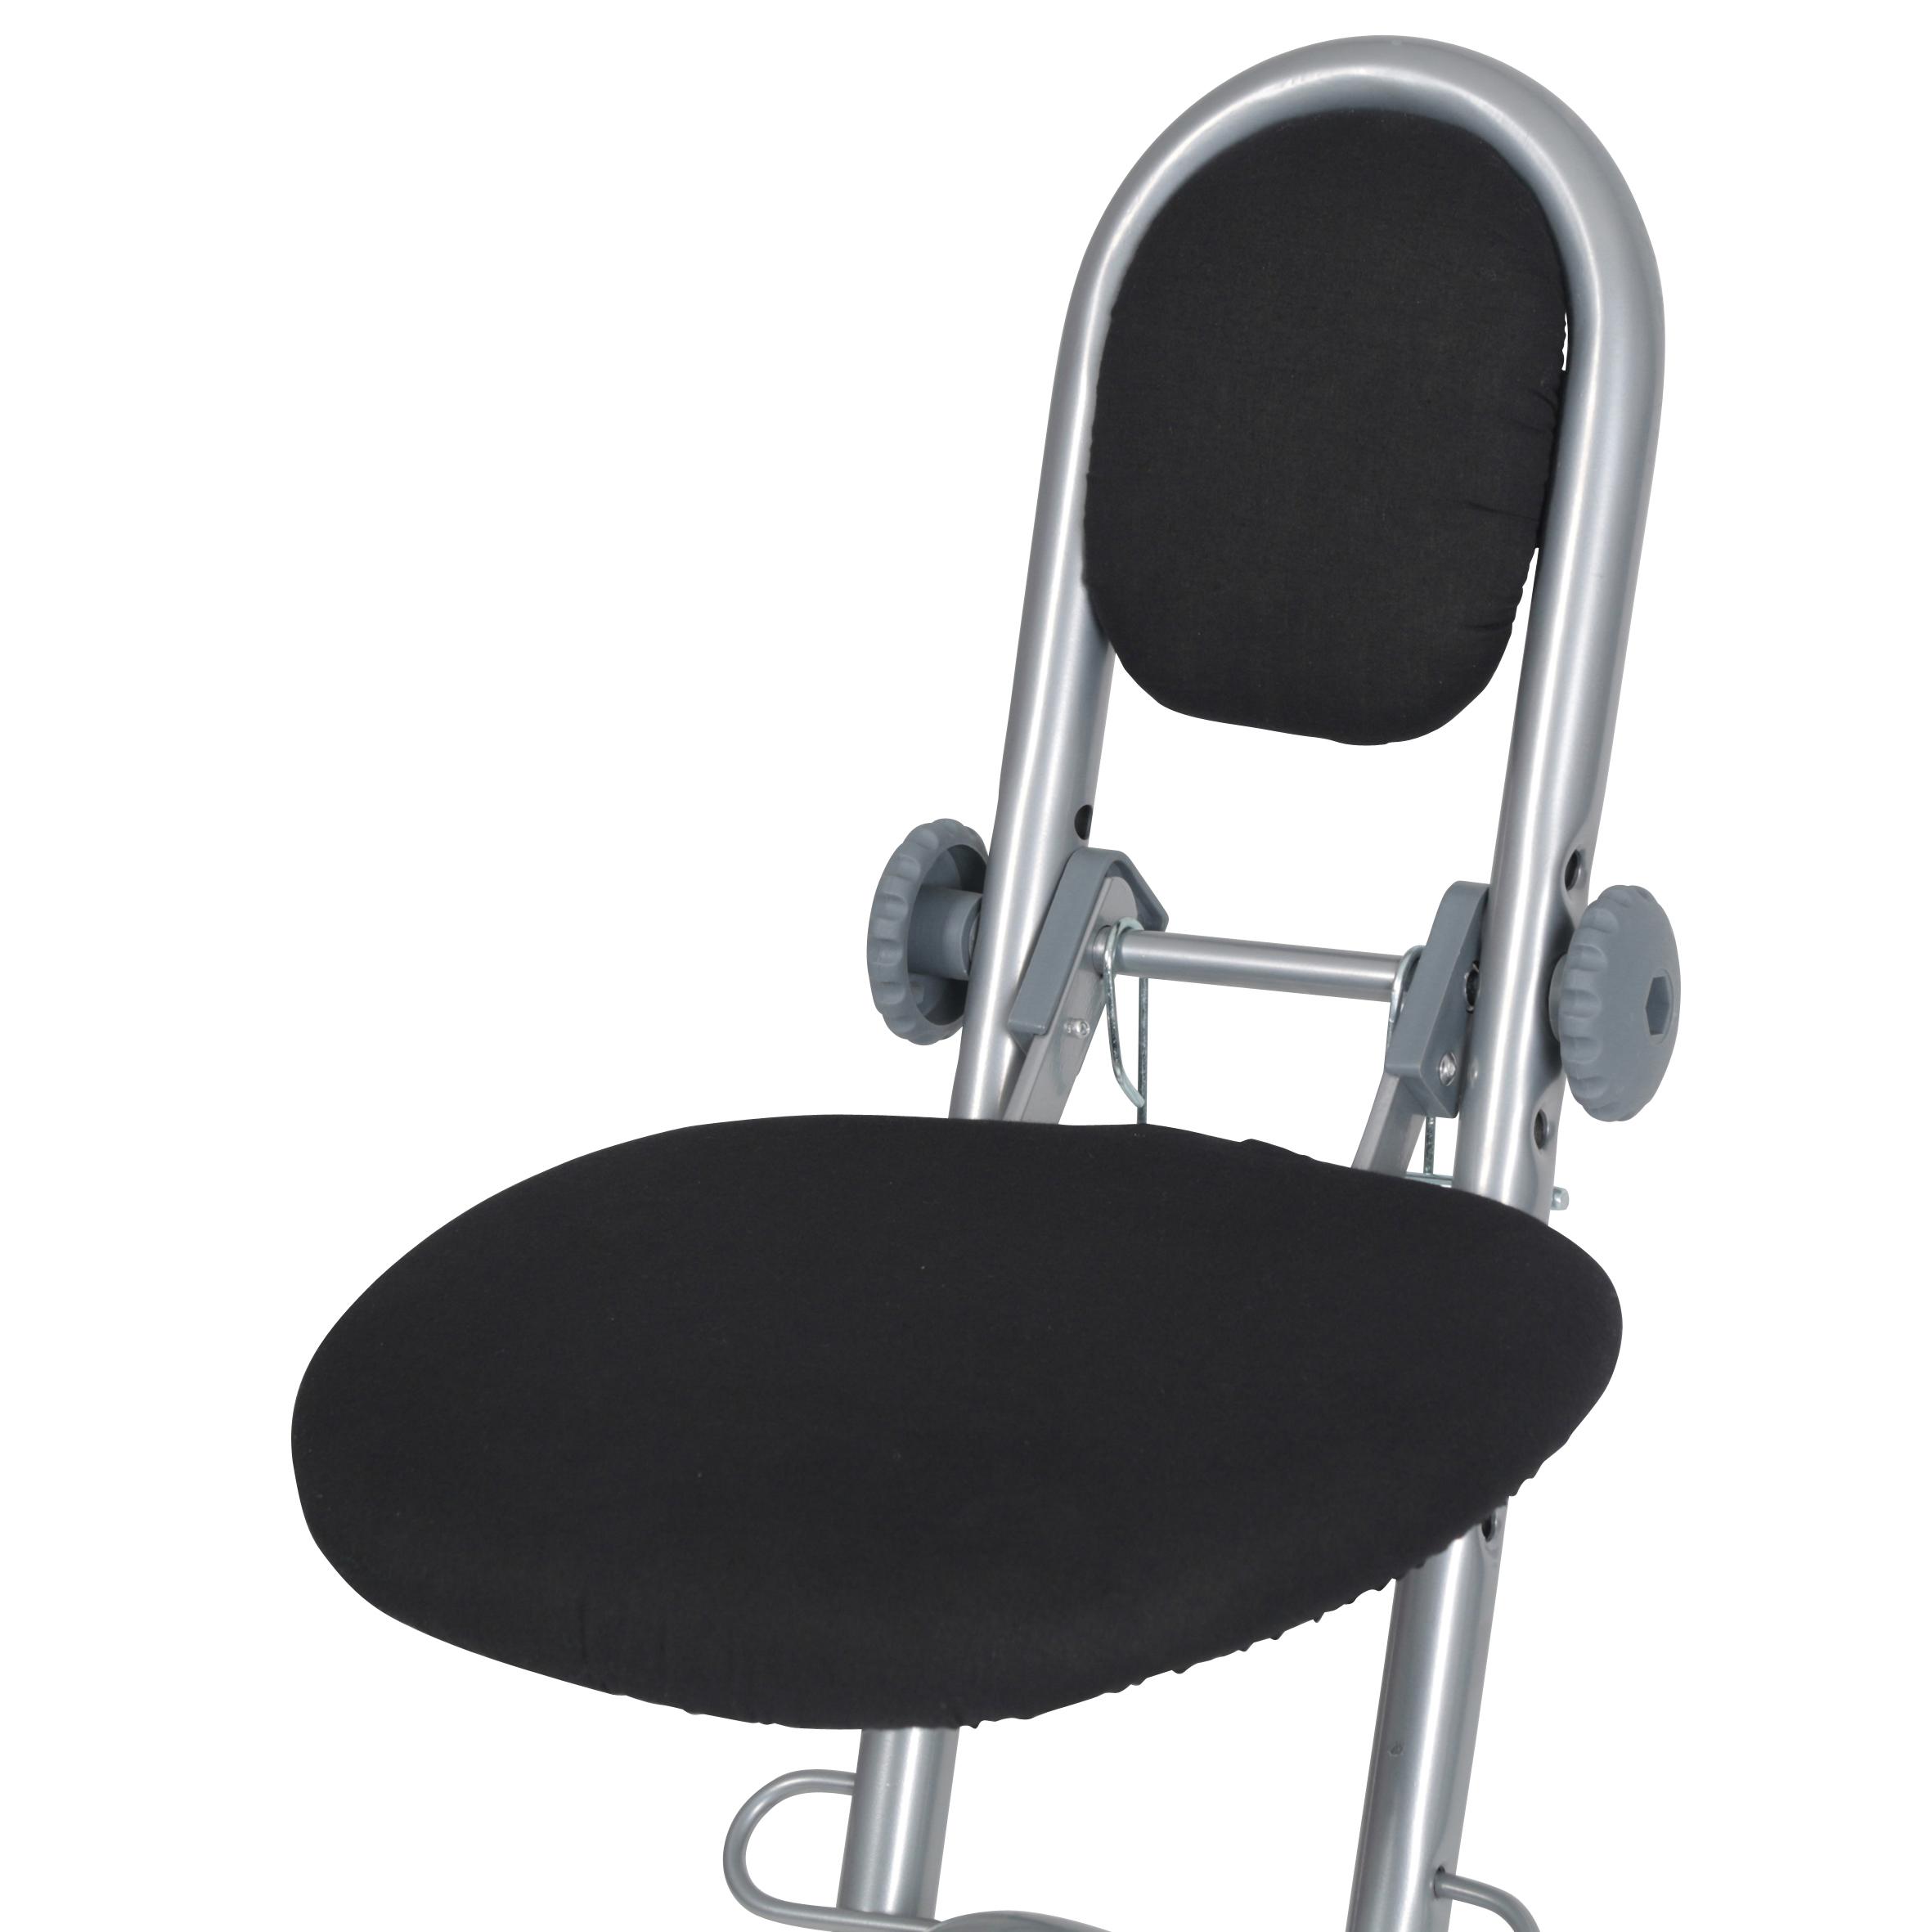 Folding Ironing Perching Stool Chair Adjustable Height